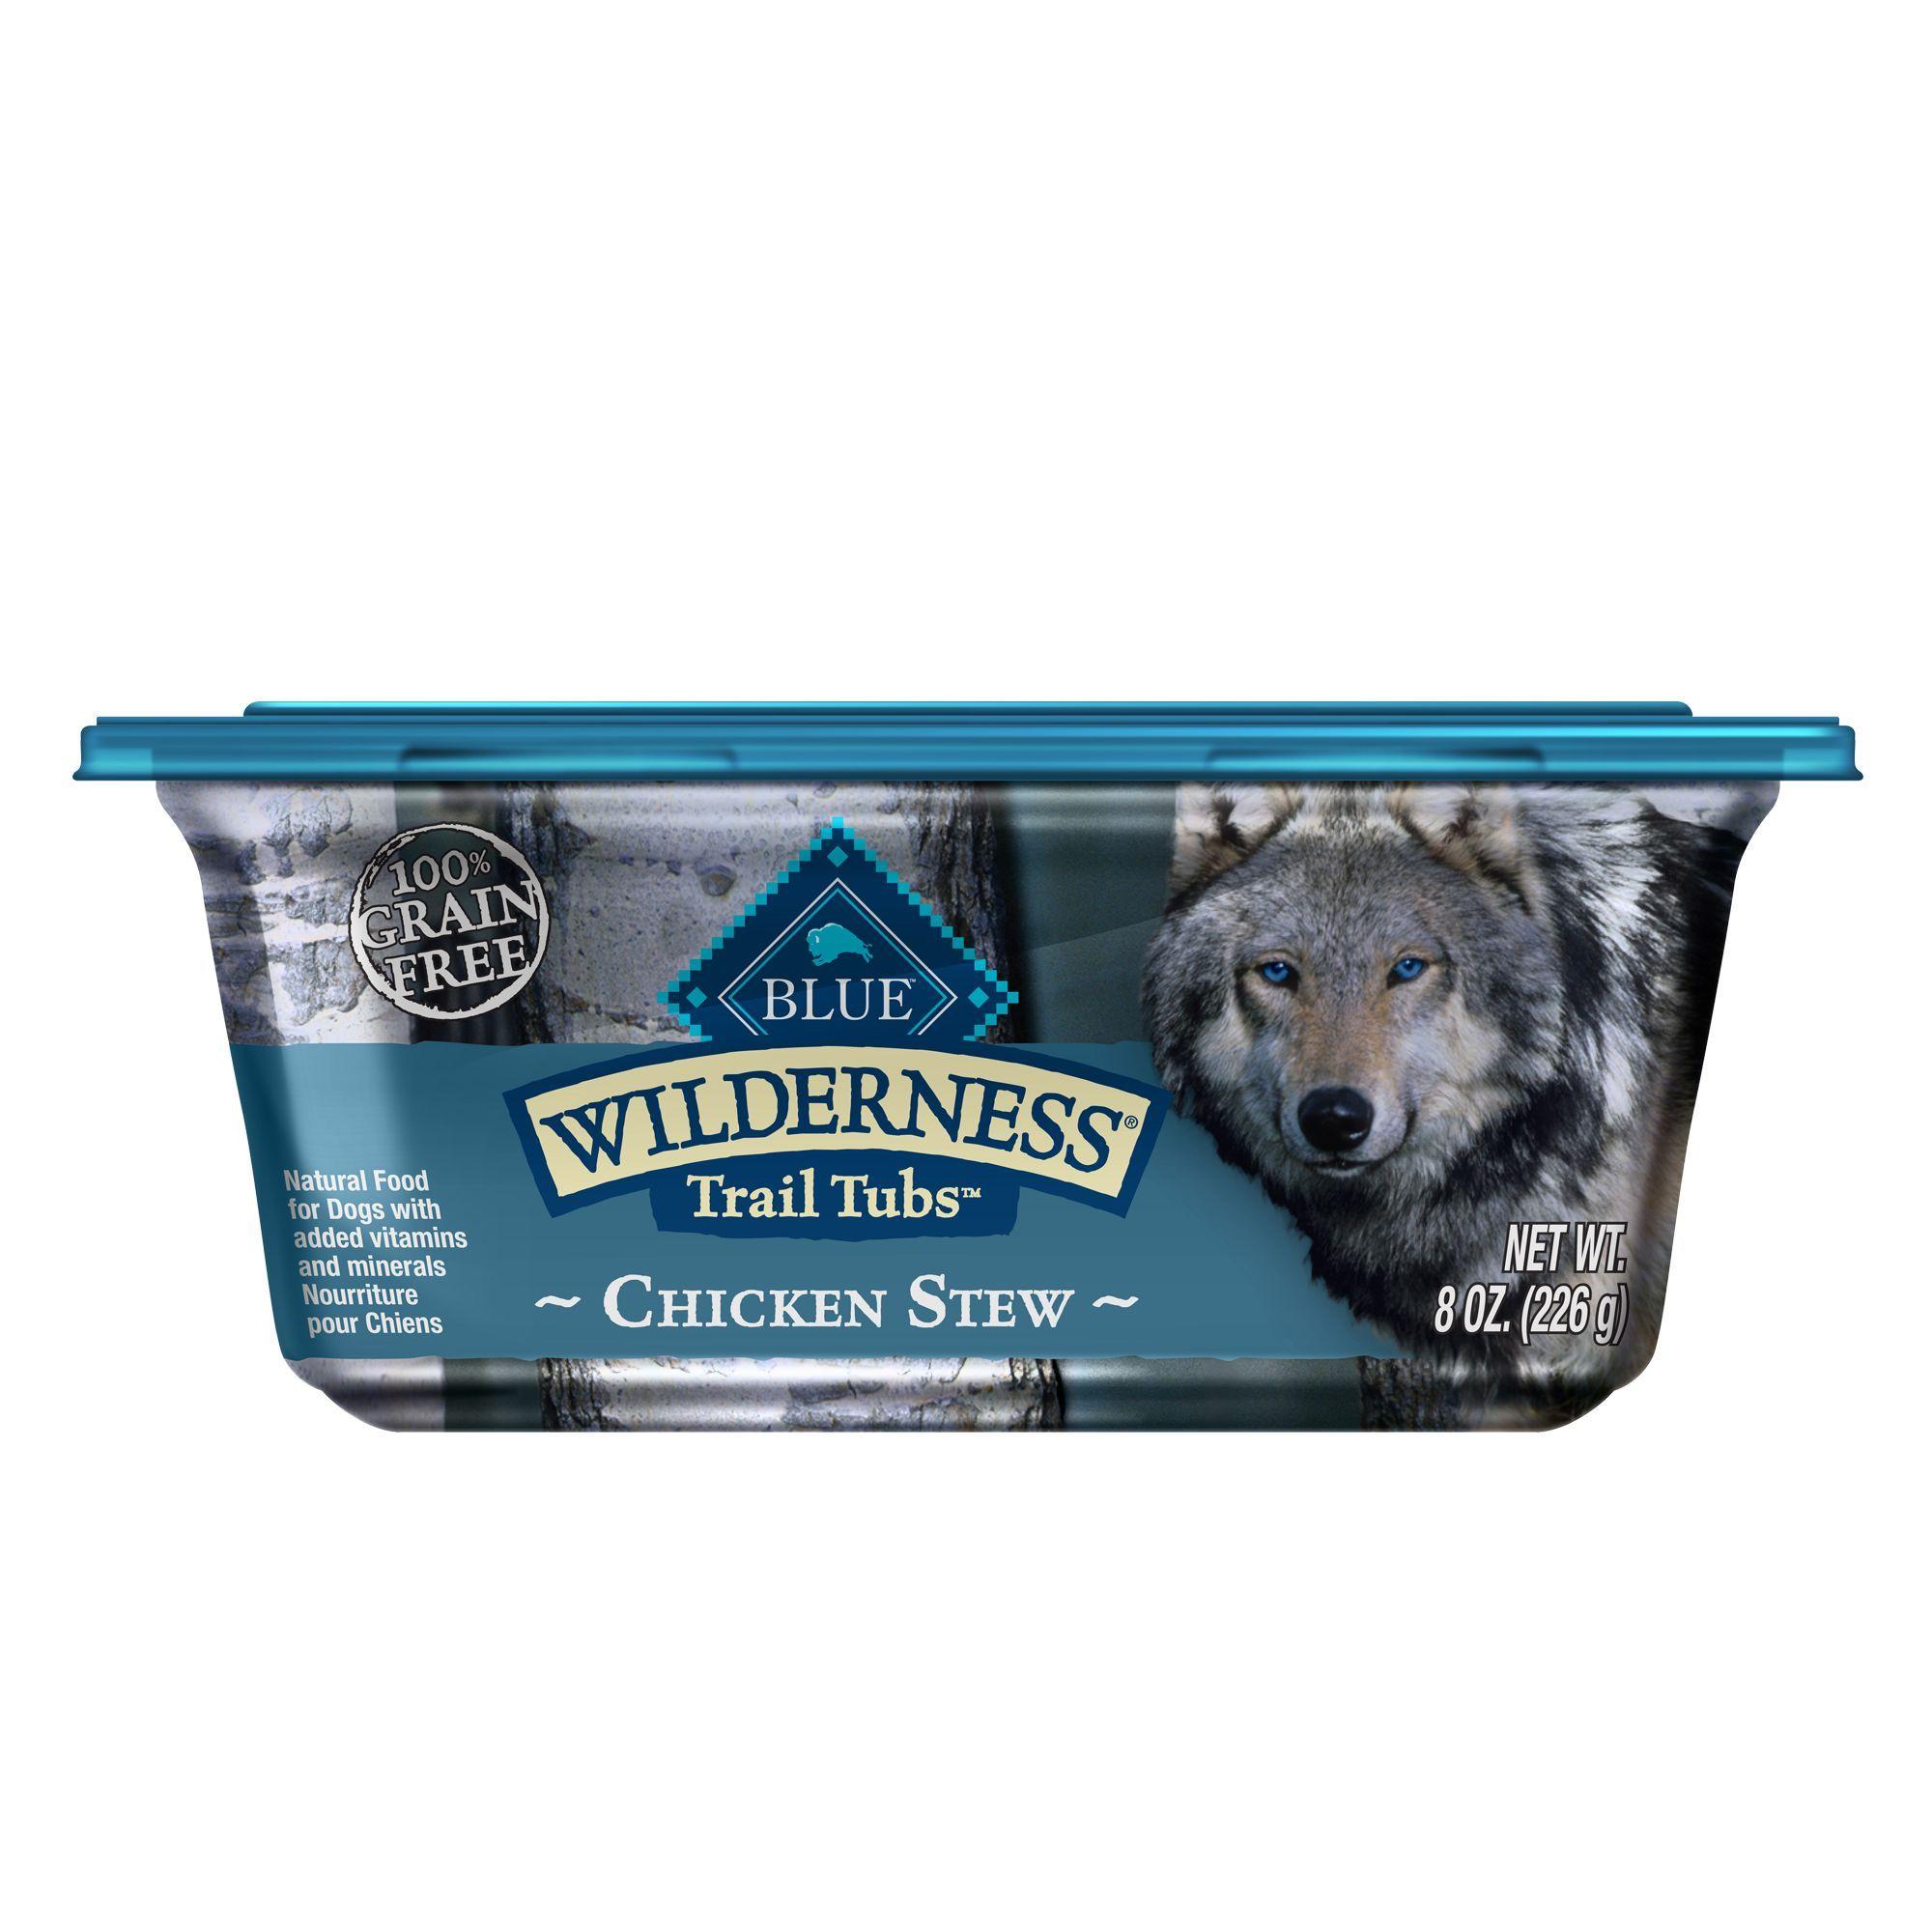 Blue wilderness trail tubs dog food natural grain free